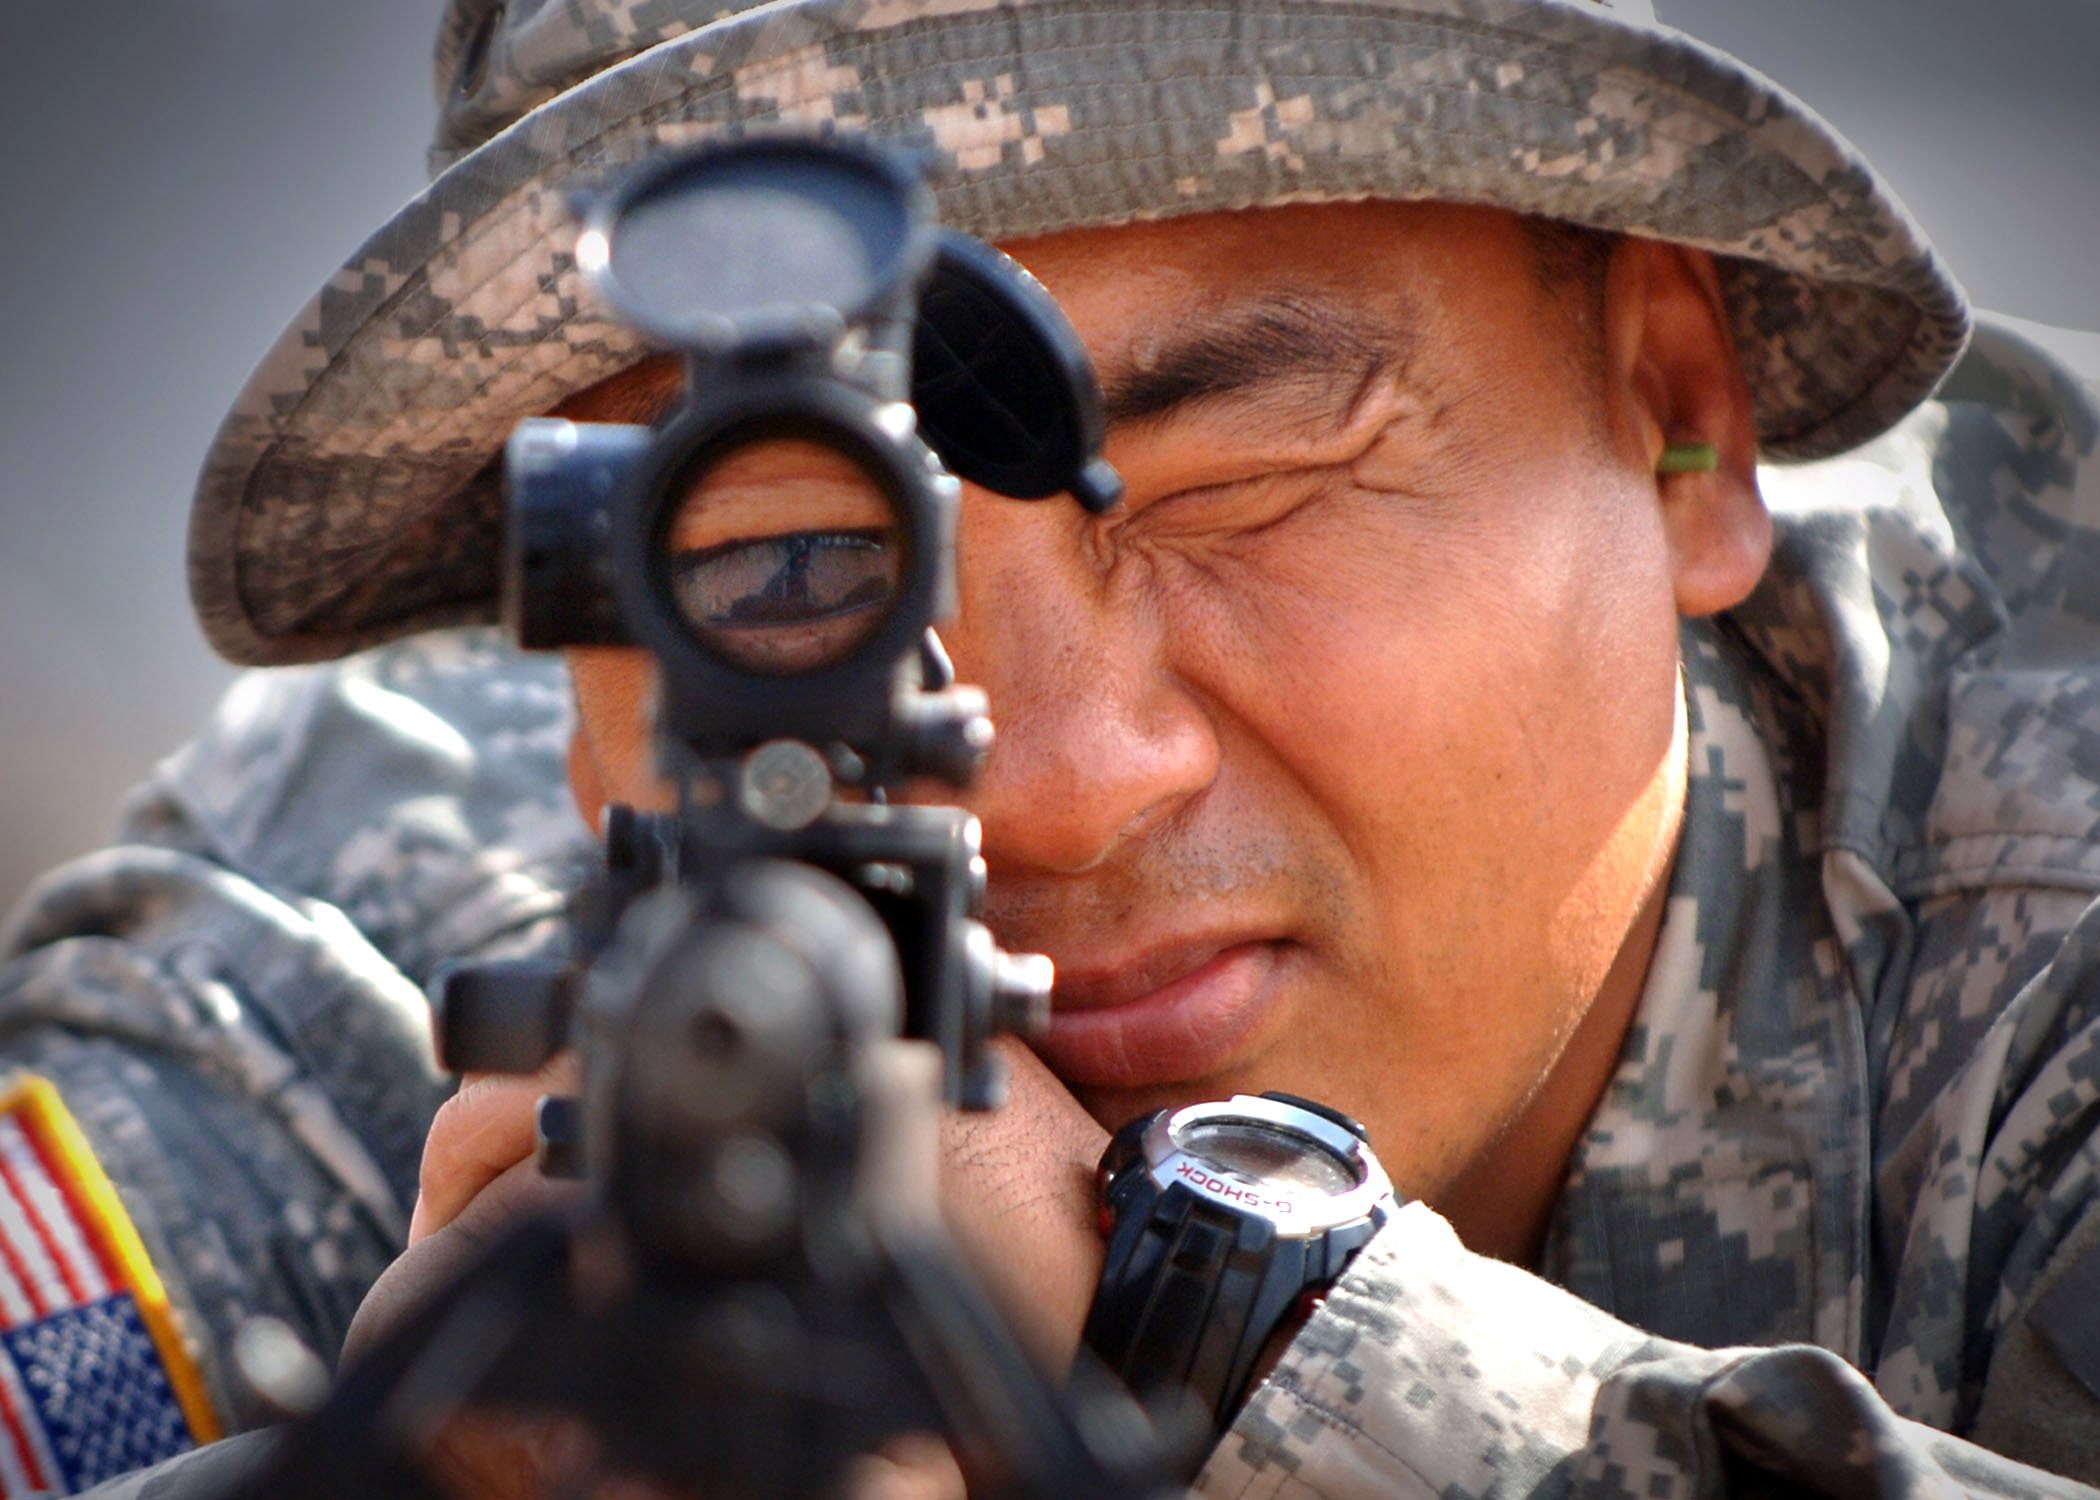 5th PSC Shotgun and M14 Rifle Shoot